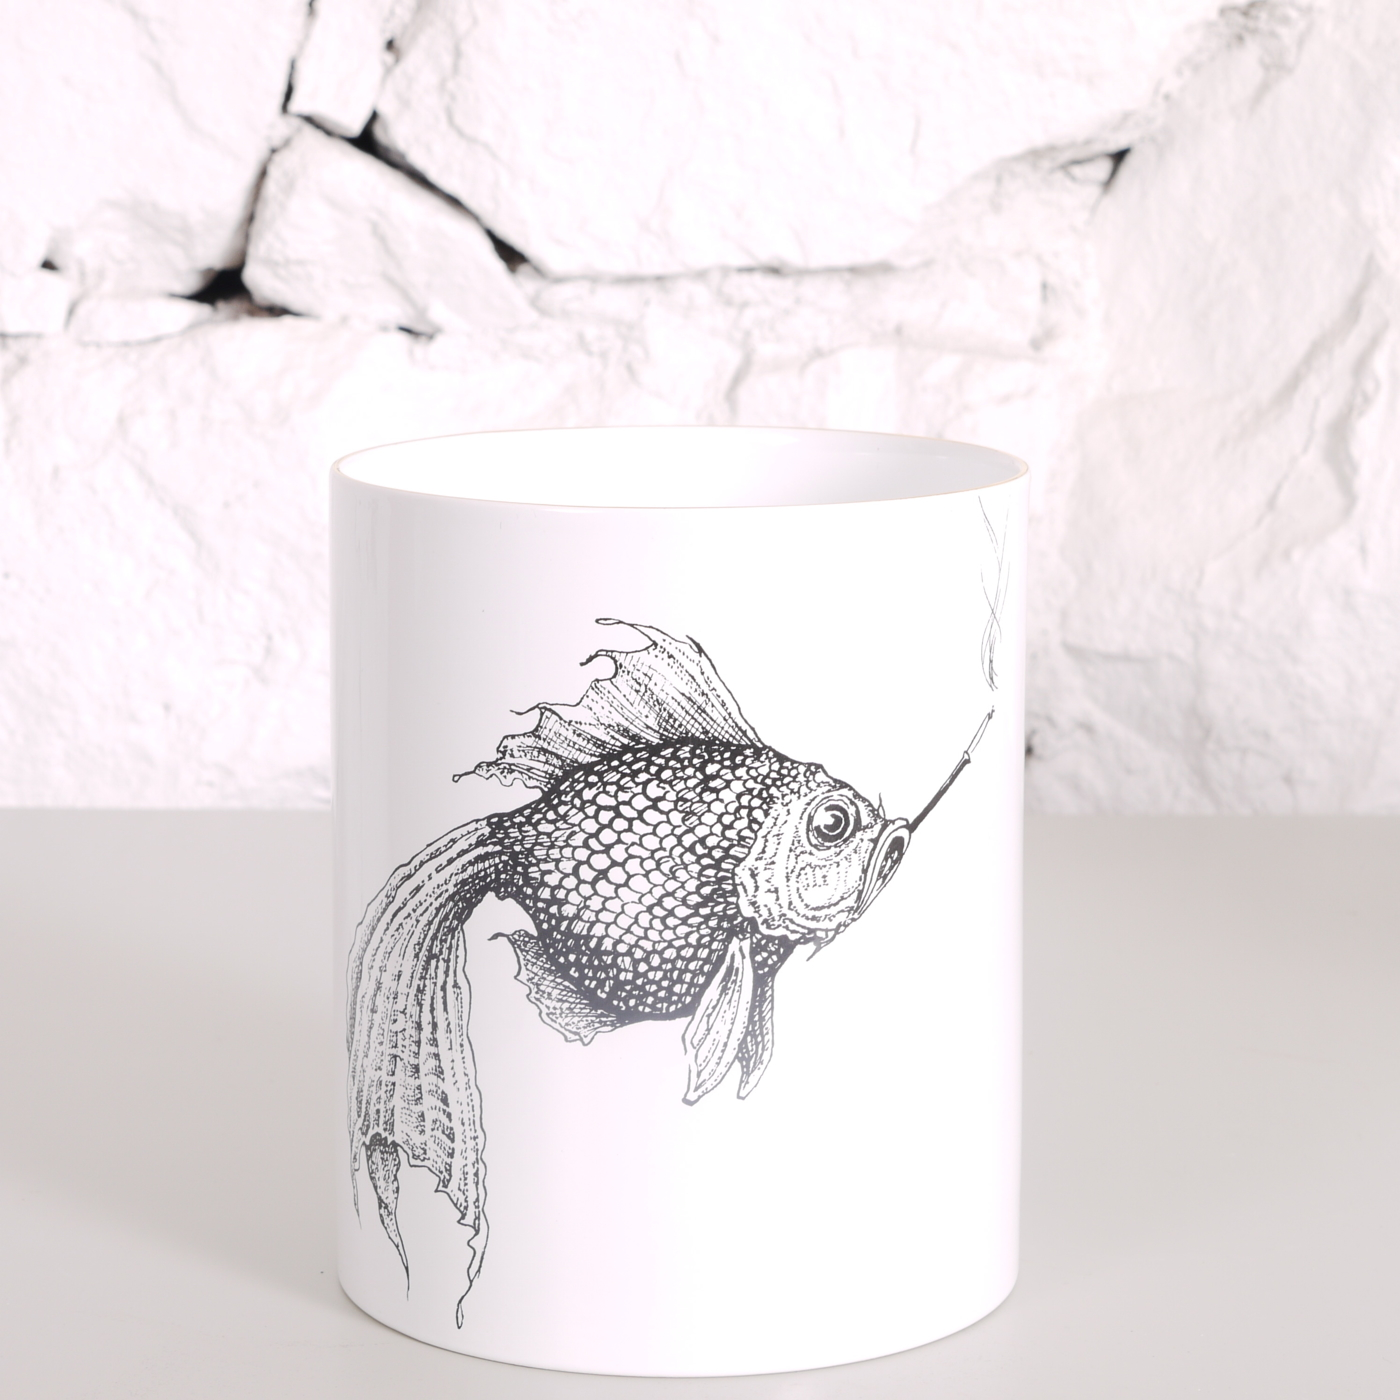 Svart fisk 1,610 SEK